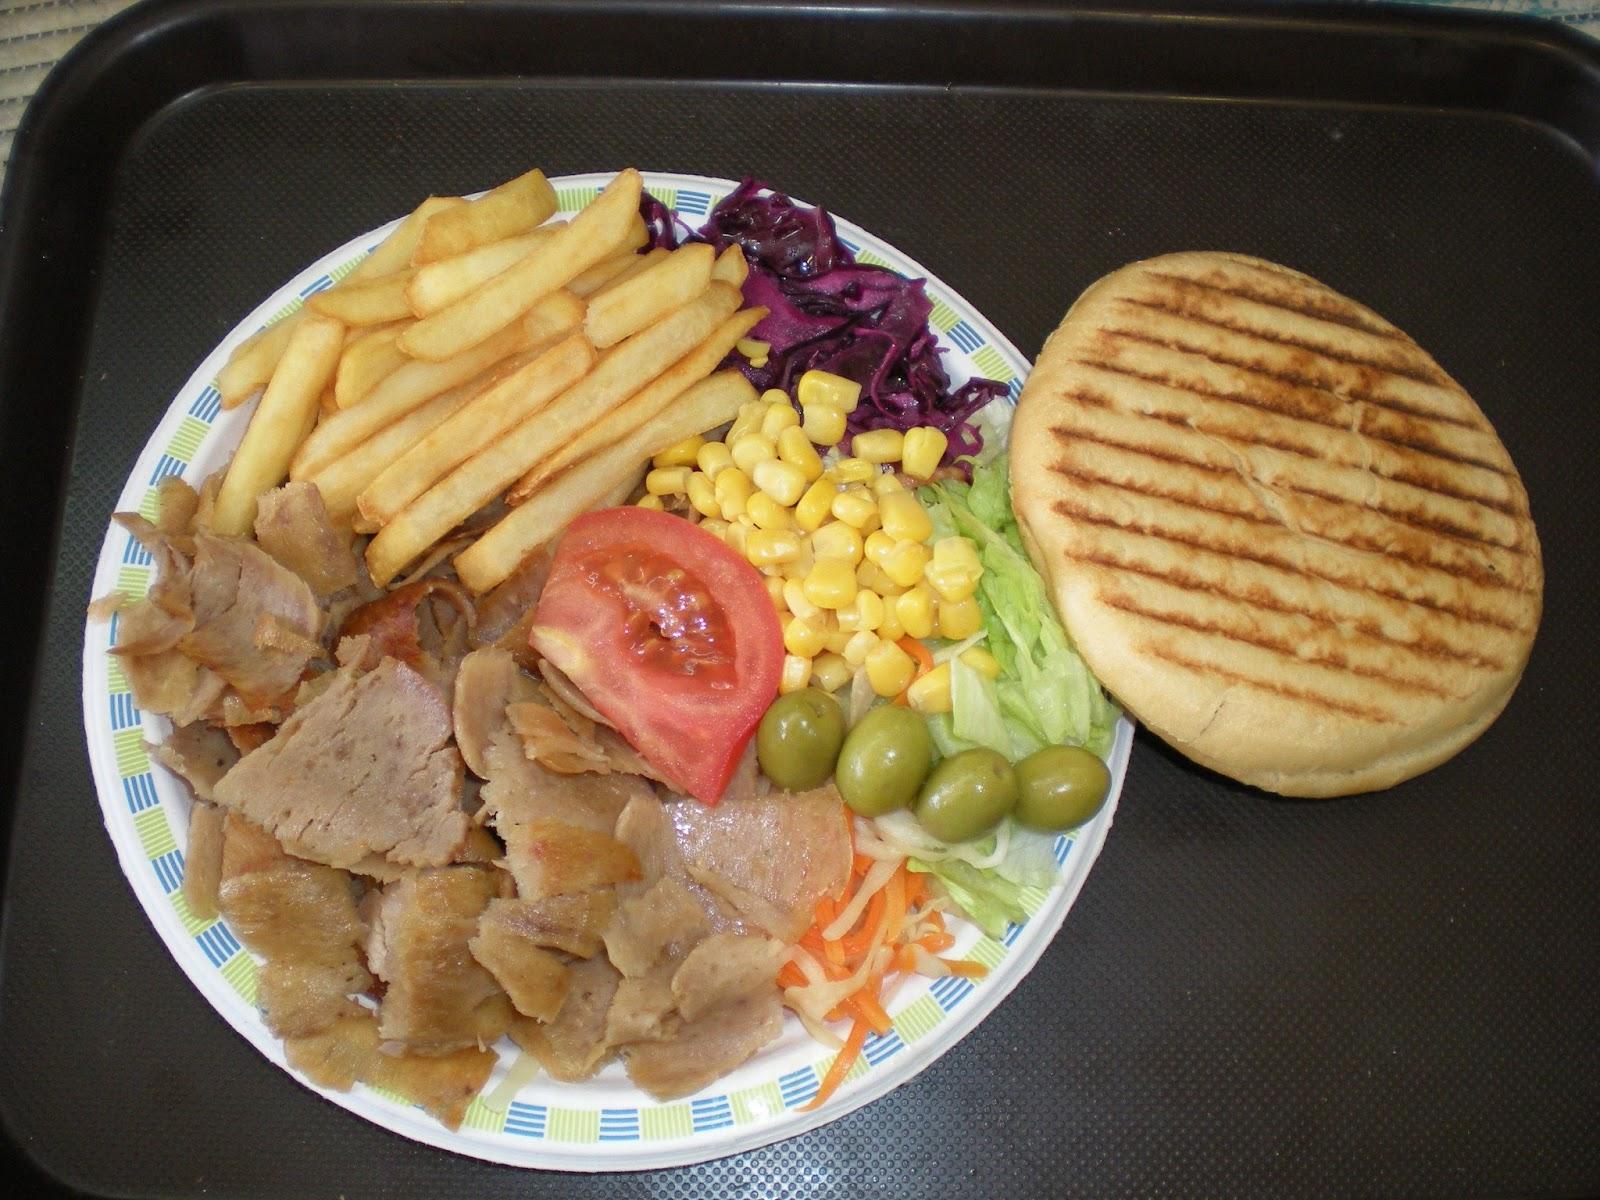 Dieta no cenar nada